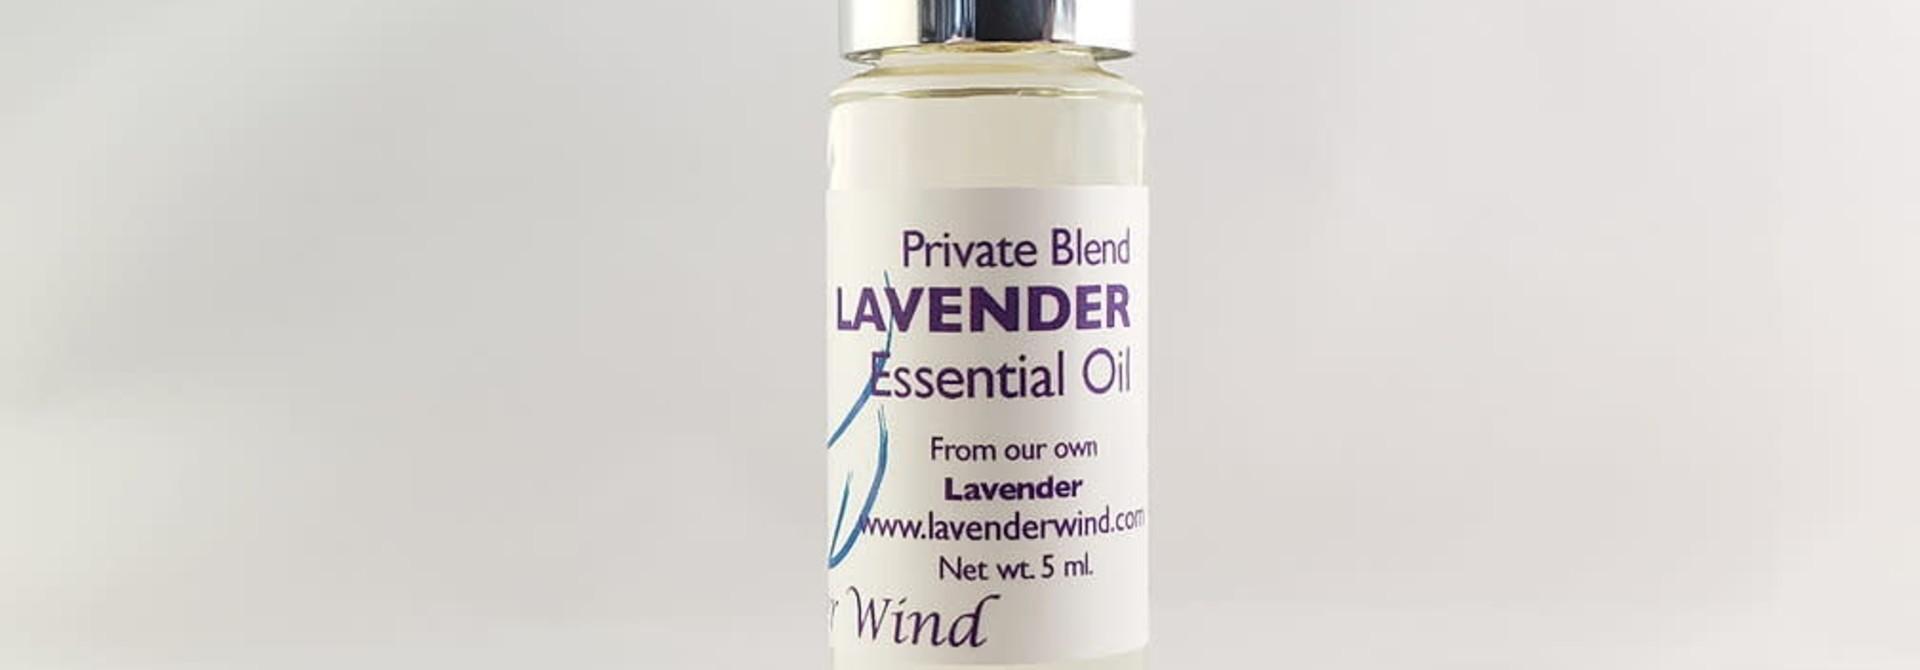 Lavender Essential Oil - Roller Ball